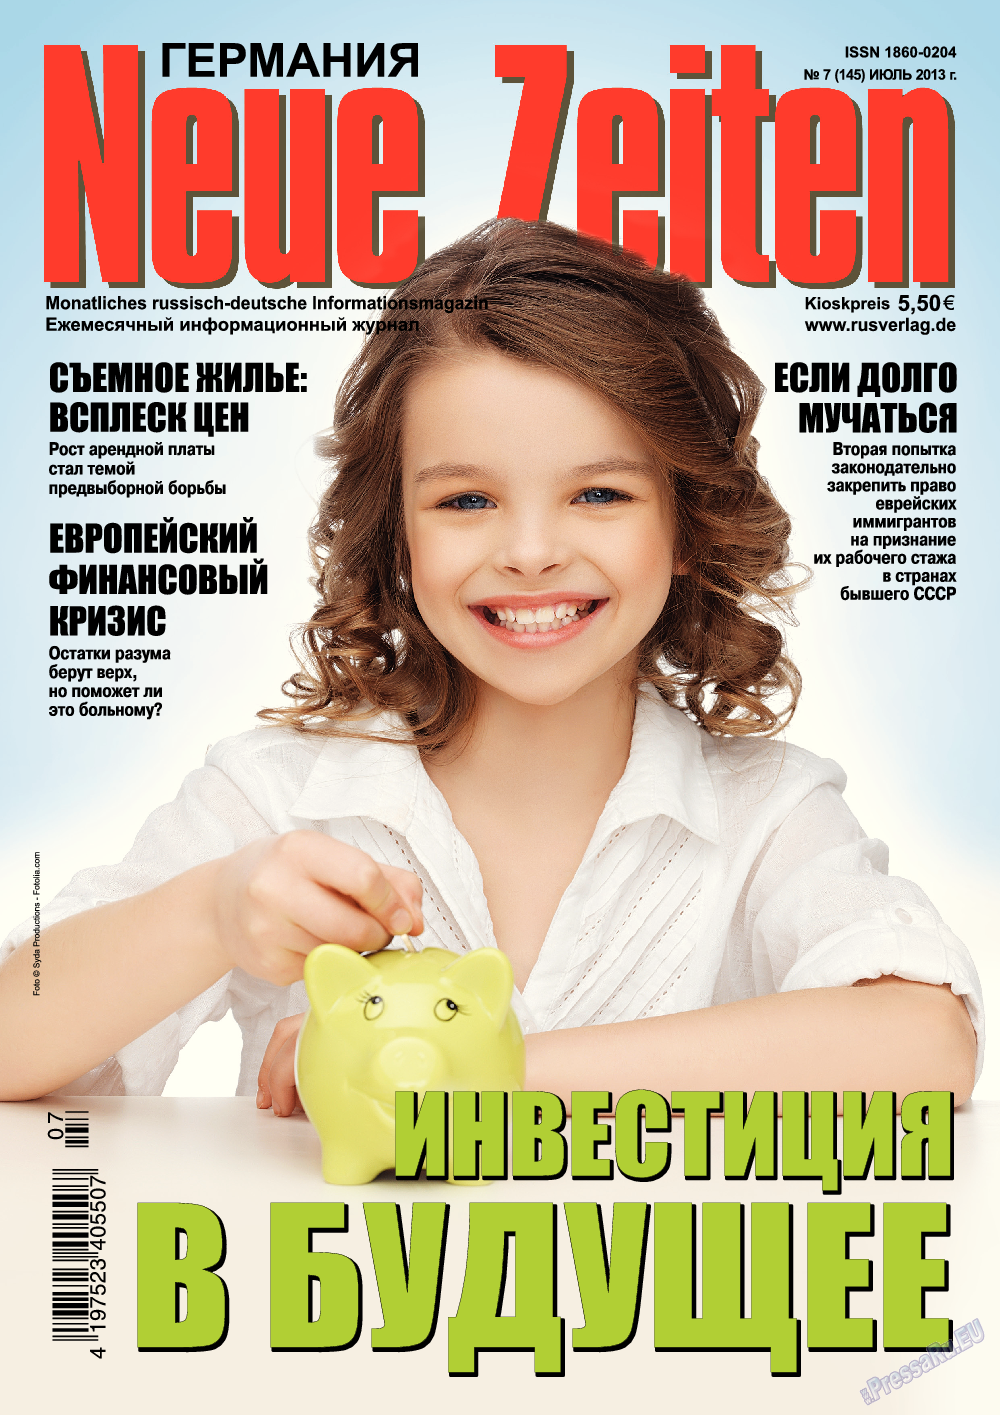 Neue Zeiten (журнал). 2013 год, номер 7, стр. 1